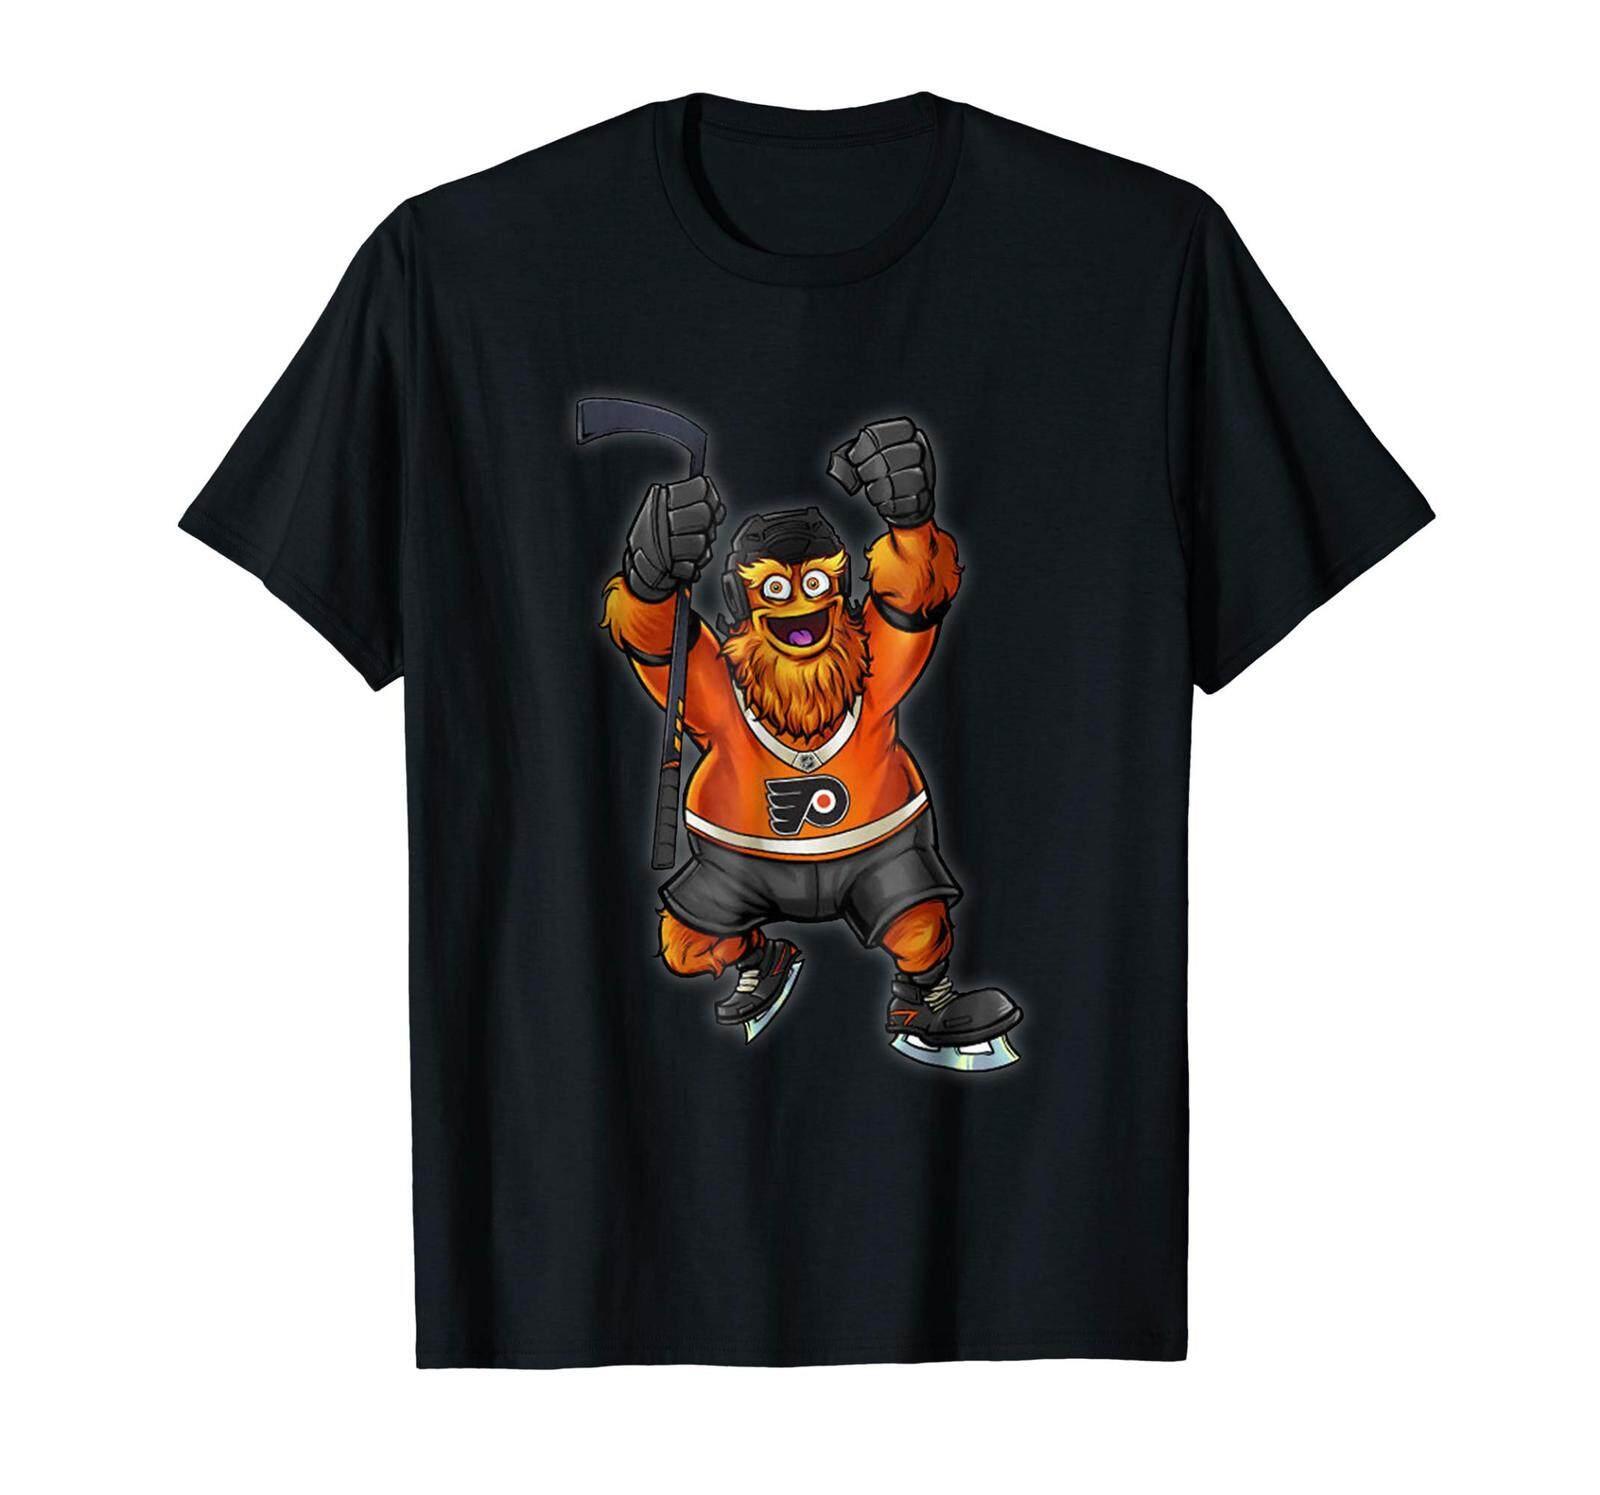 576db3d8883 Keep It Gritty Shirt Philadelphia Hockey Mascot Cotton Men T-Shirt Black